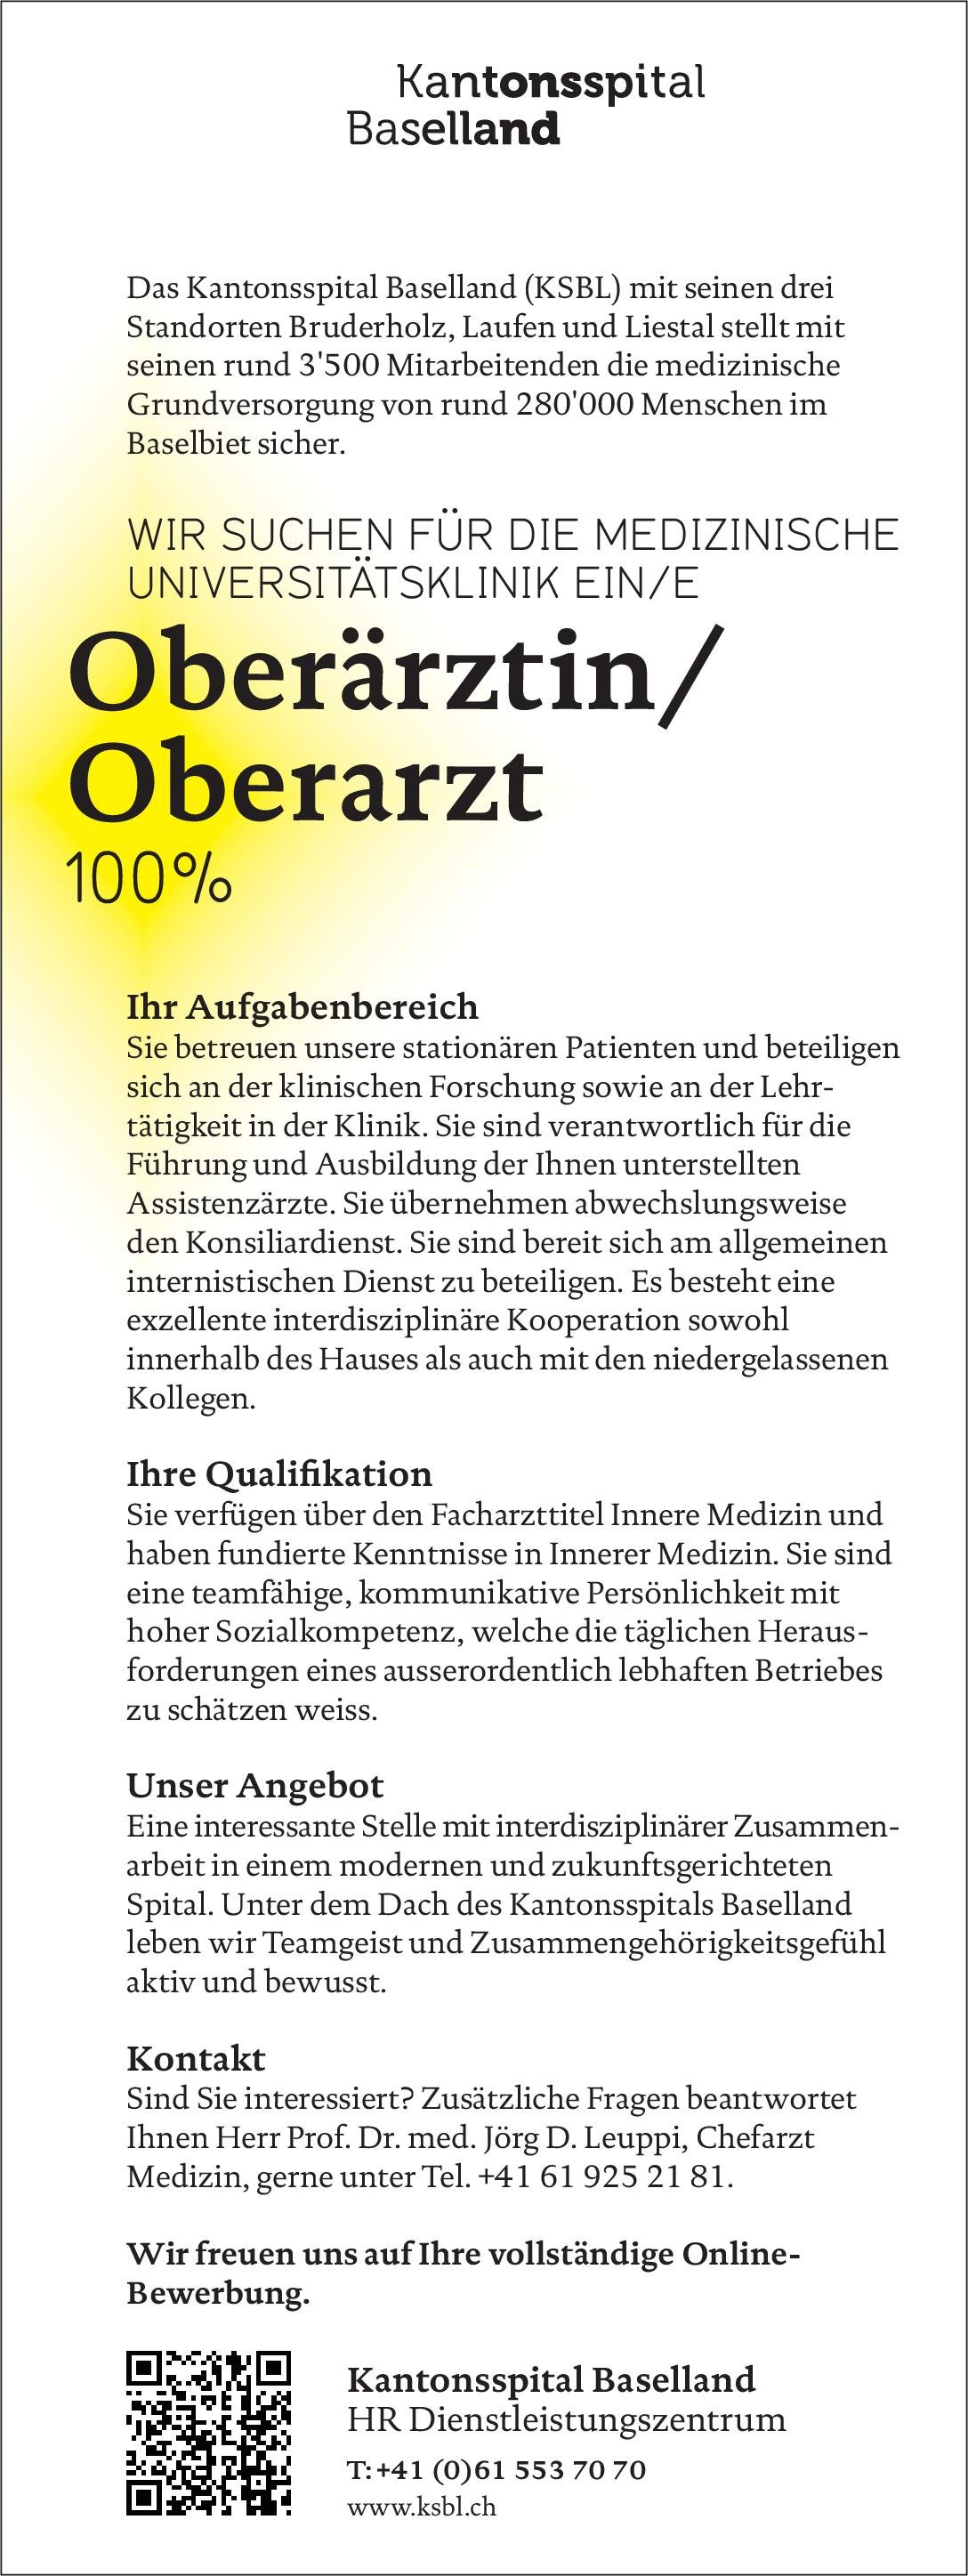 Kantonsspital Baselland (KSBL) Oberärztin/Oberarzt 100% Innere Medizin  Innere Medizin, Innere